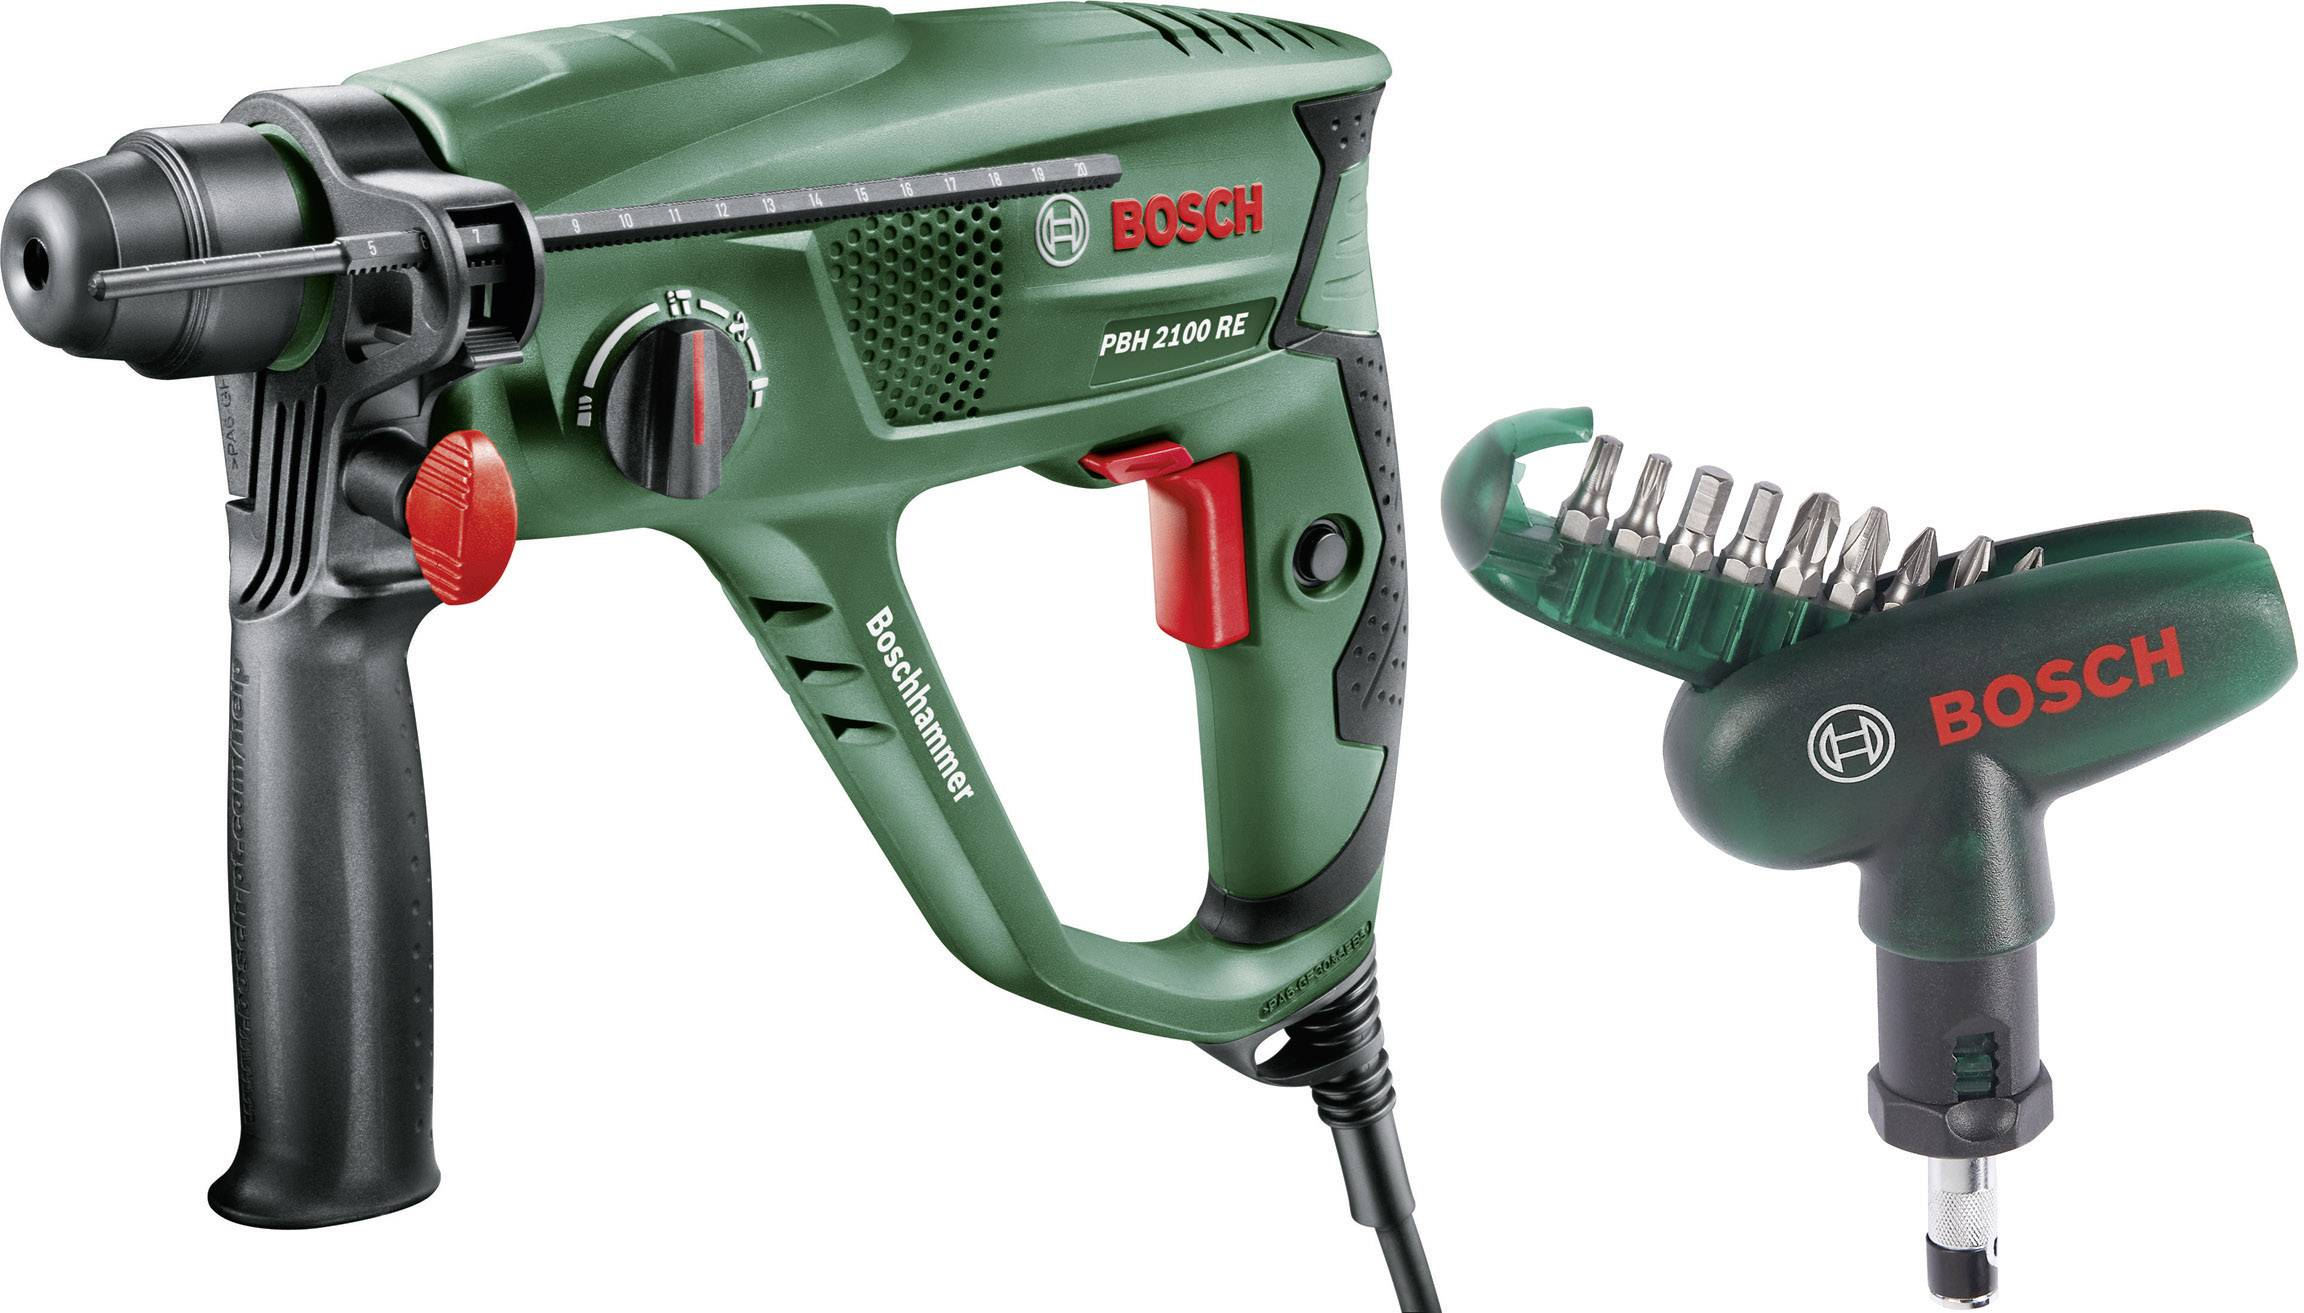 Magnifiek Bosch PBH 2100 RE Boorhamer 550 W Incl. 10-delige schroefbitset WQ49